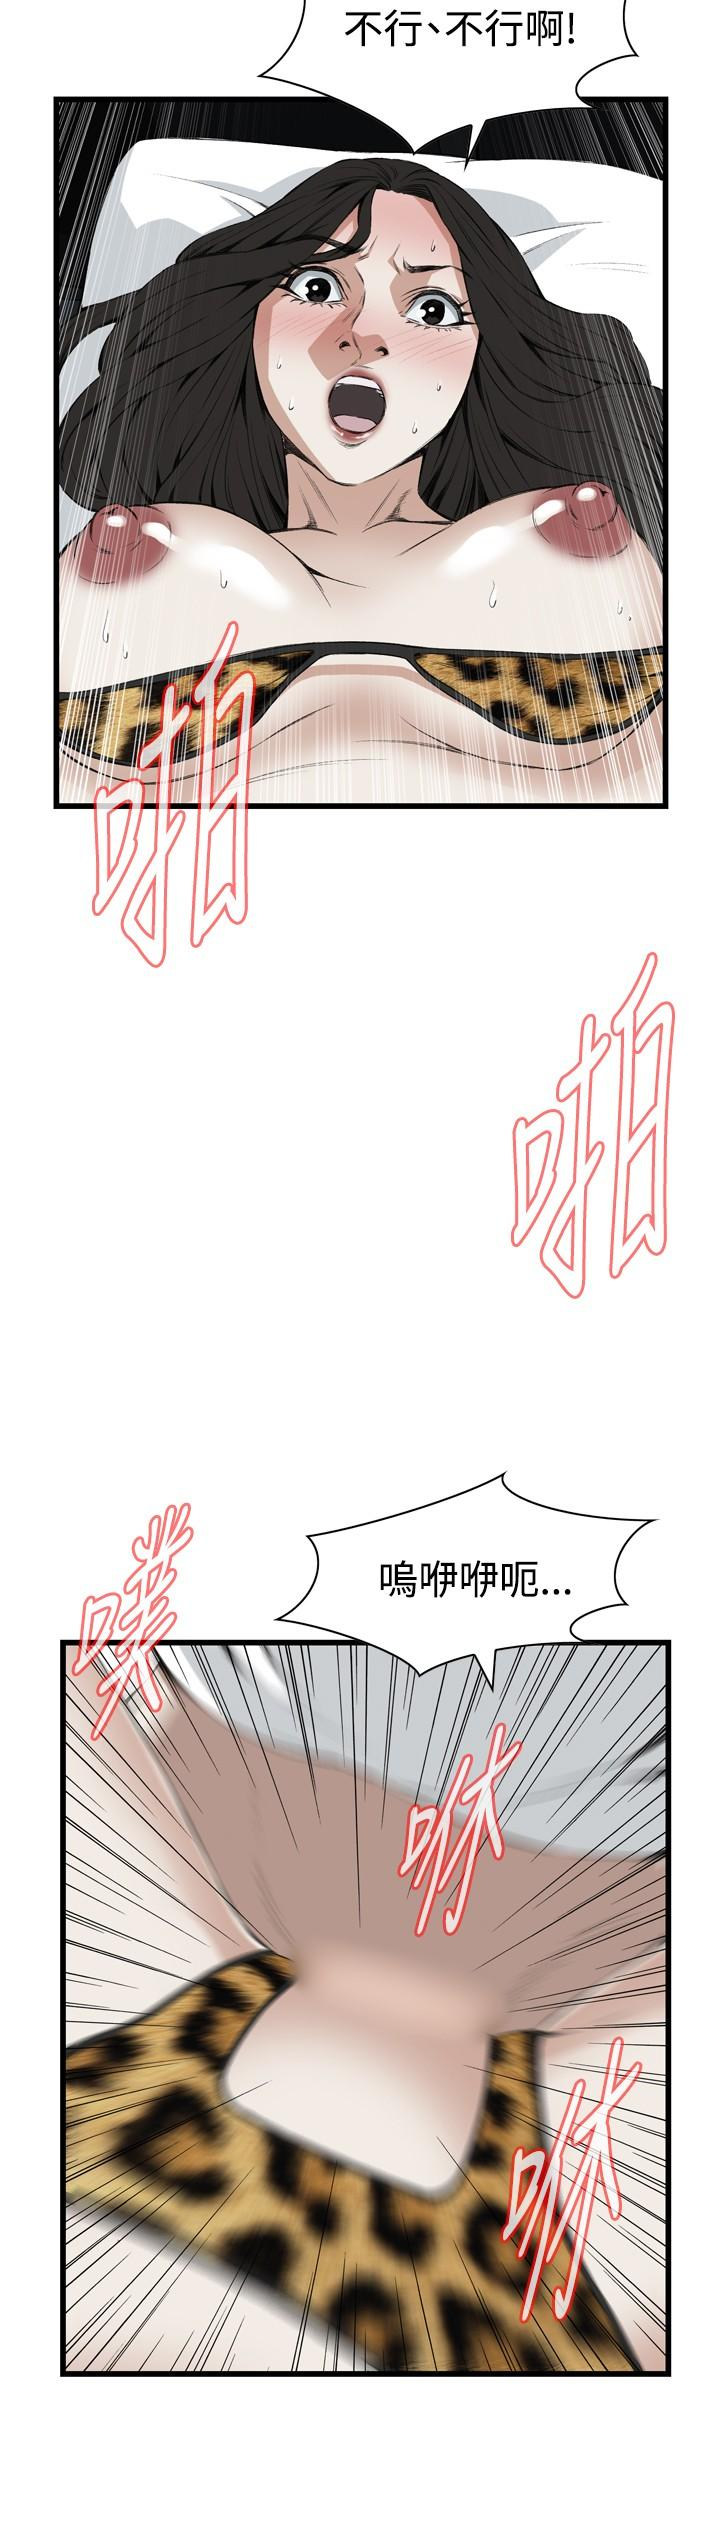 Take a Peek 偷窥 Ch.39~55 [Chinese]中文 477